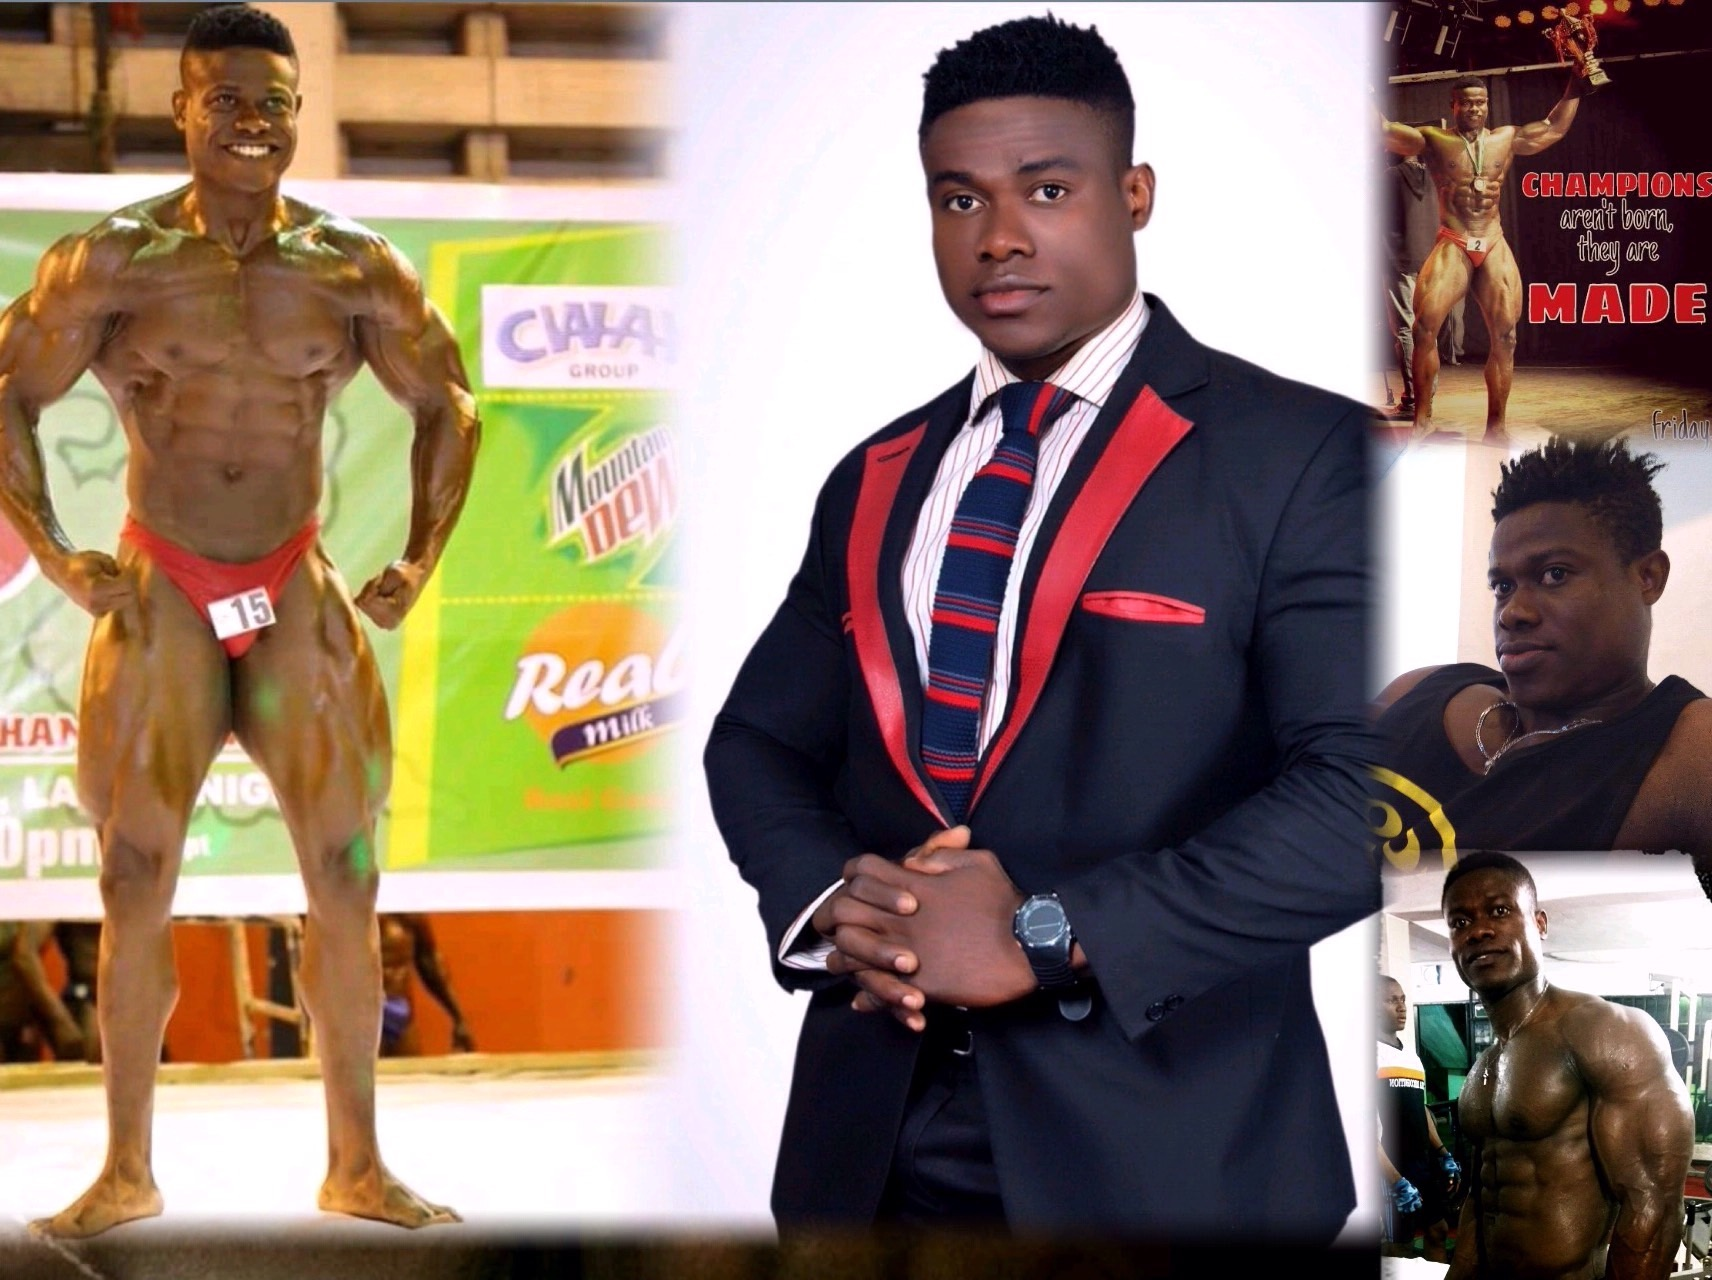 Nigeria Champion, Ifesinachi Ibenne: Bodybuilding Transformed Me, My Mom Now Calls Me Five-In-One Son